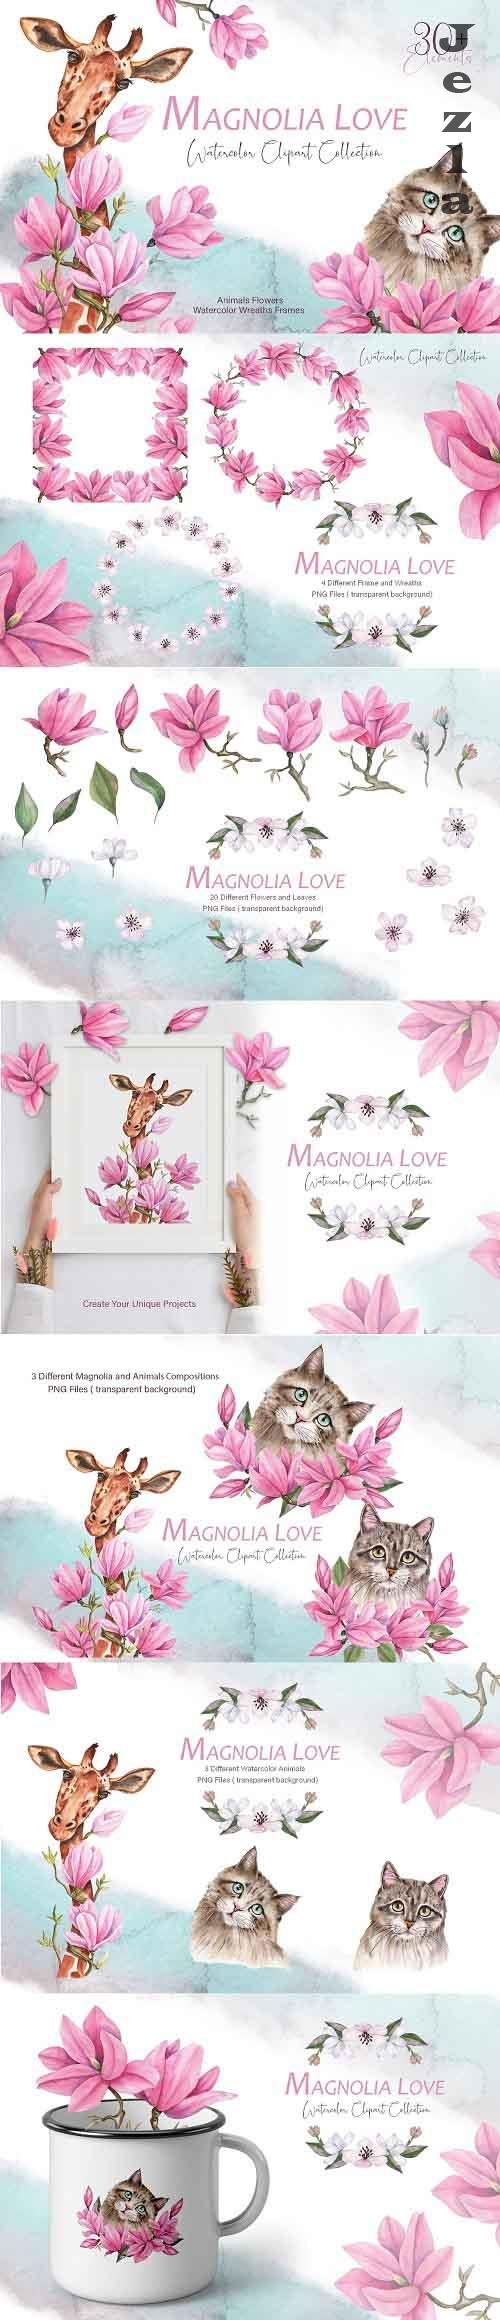 Magnolia Love Watercolor Collection -  5892025